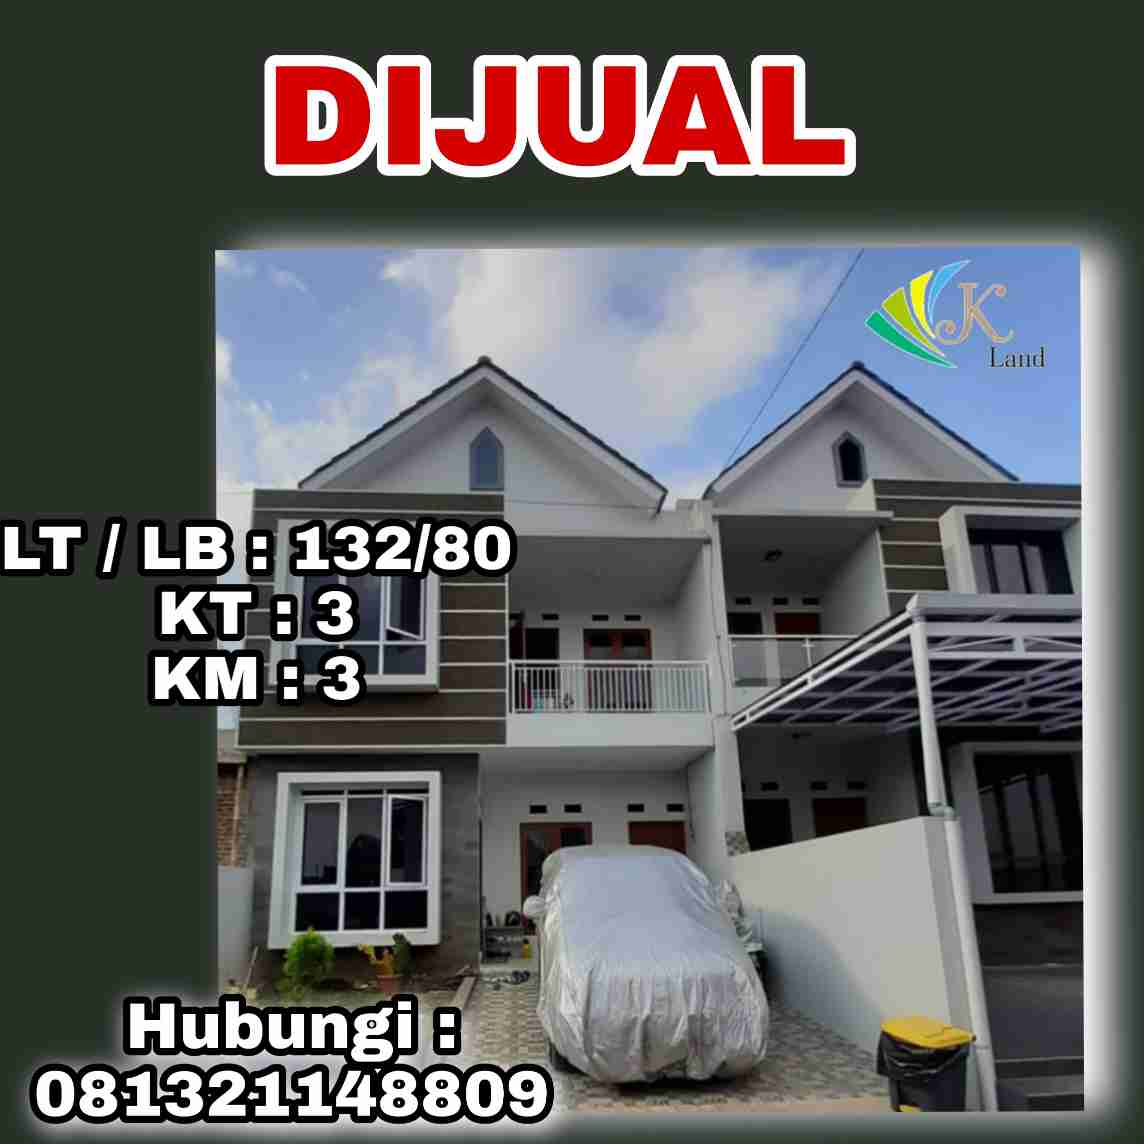 Dijual Rumah Nyaman Modern Bandung